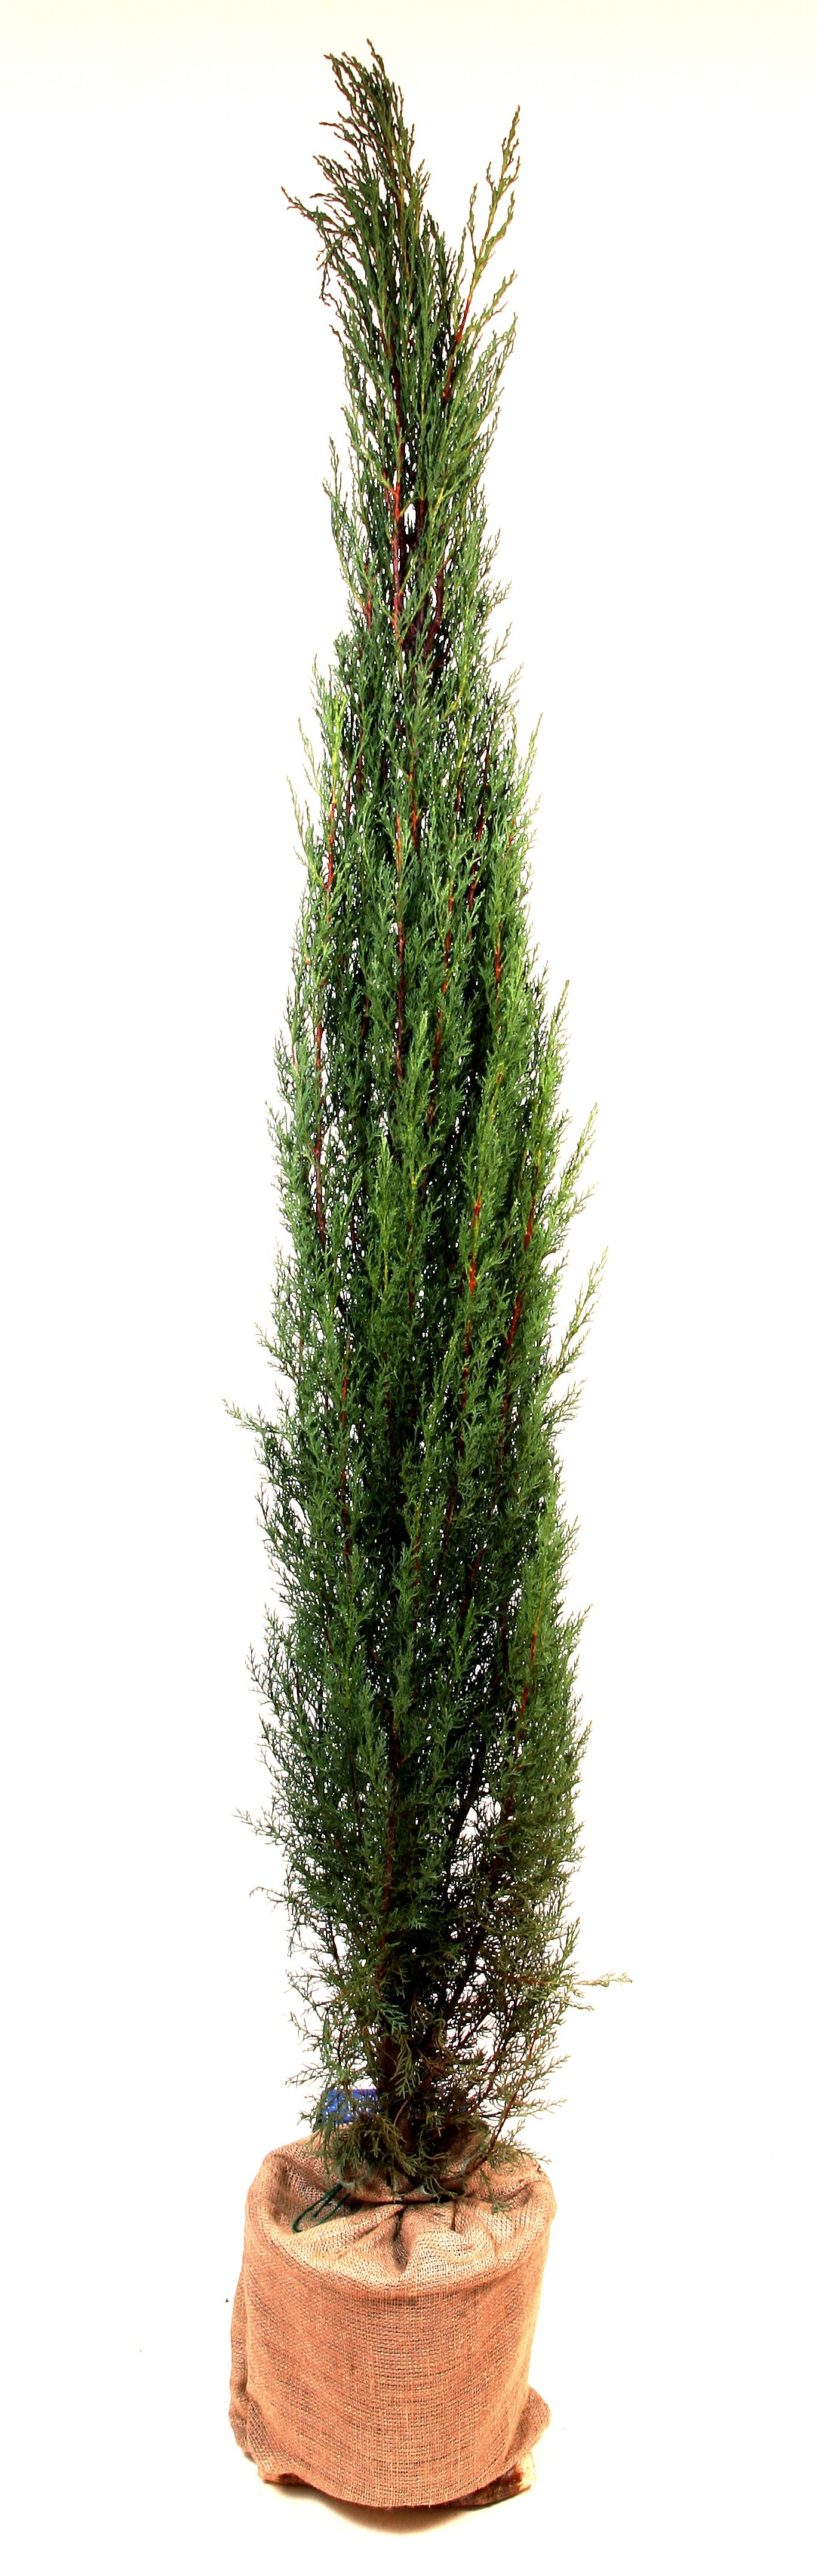 Starter Italian Cypress tree, £80, Trees Direct